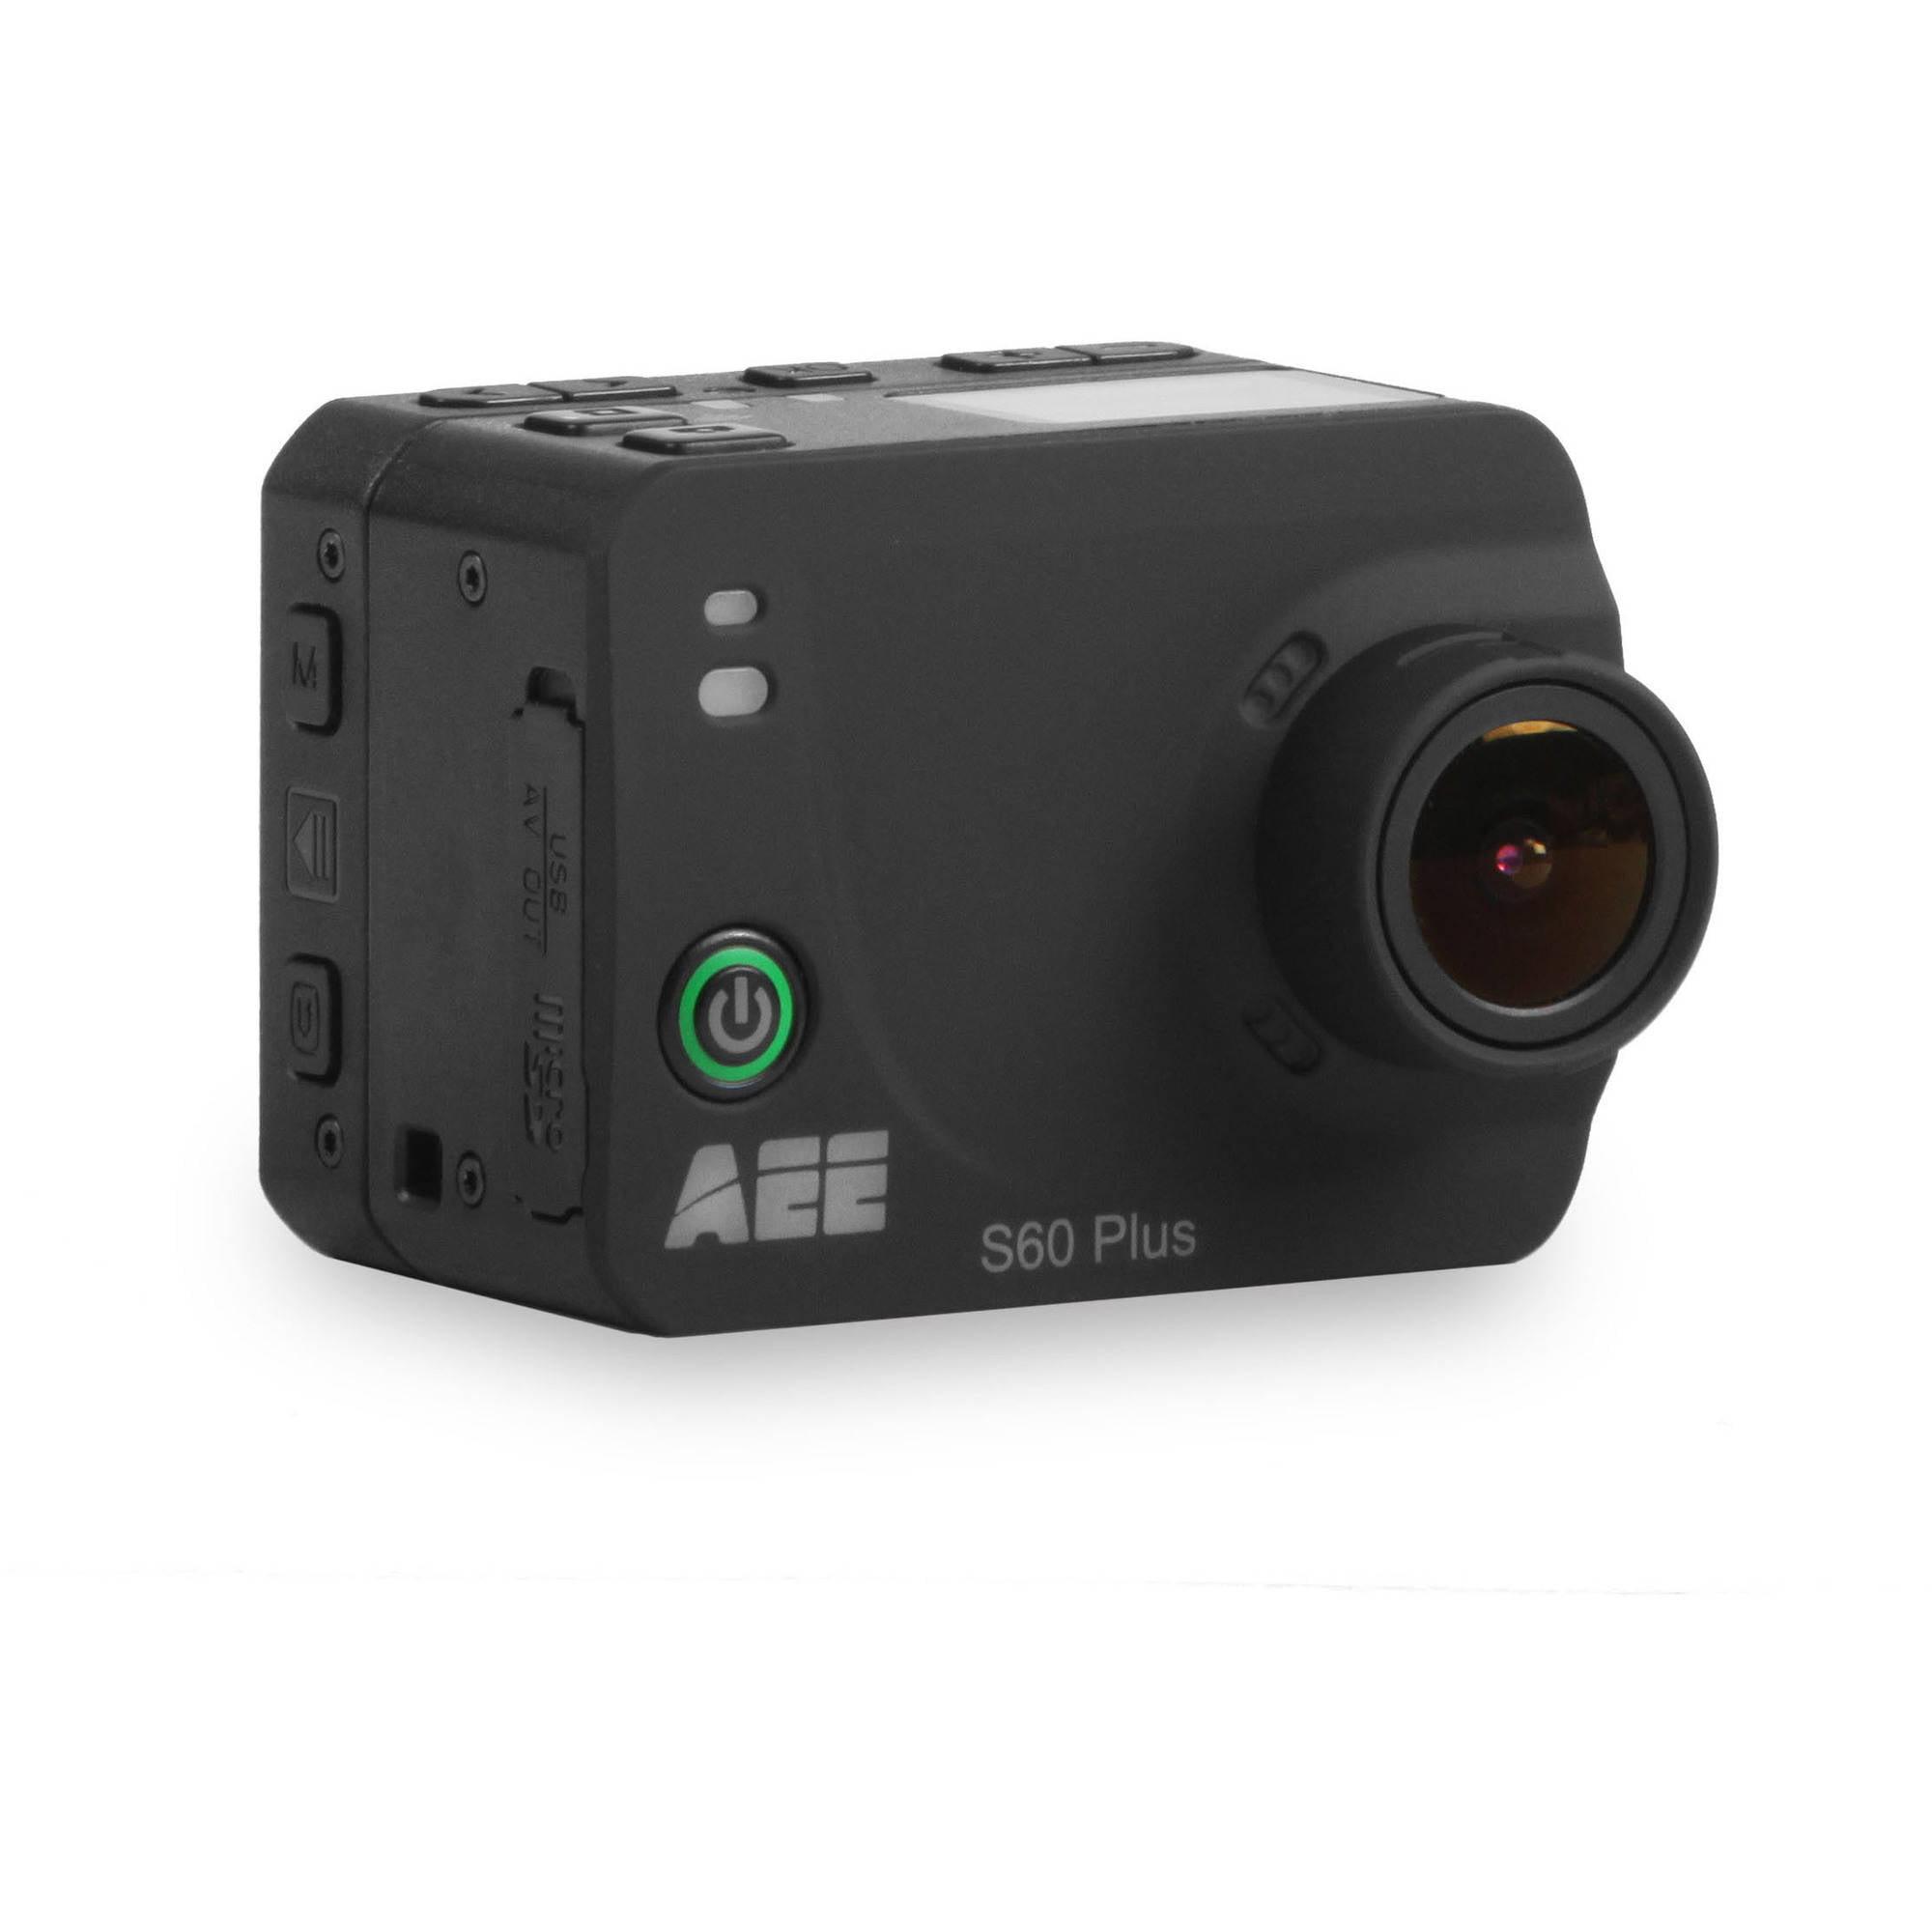 Image of AEE S60 Plus 1080p 16 Megapixel WiFi Camera